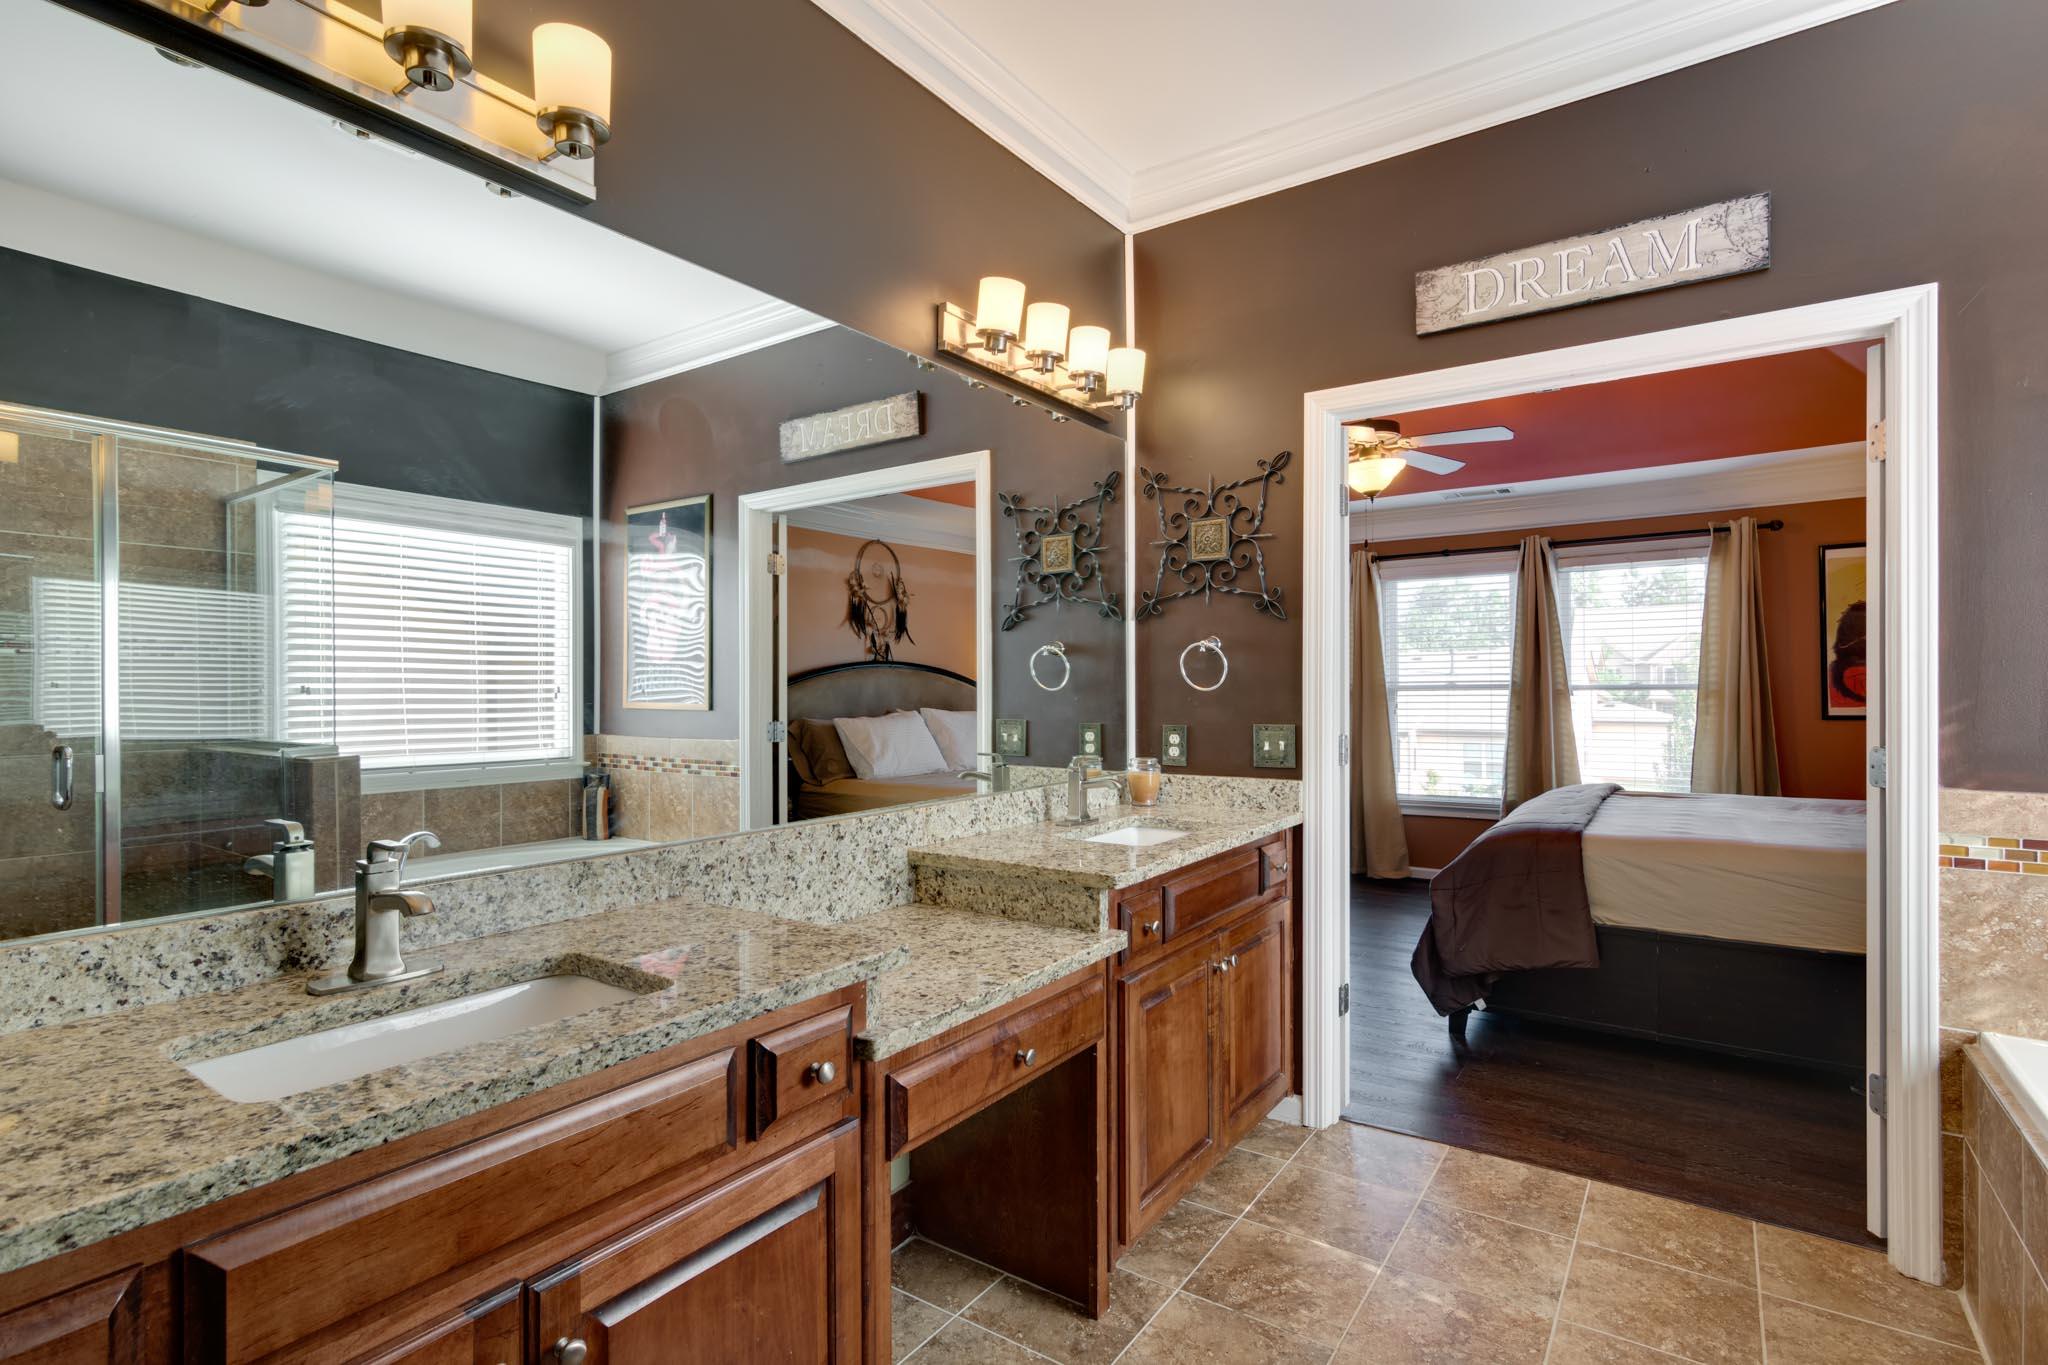 real_estate_photographer_bathroom_photography-3.jpg